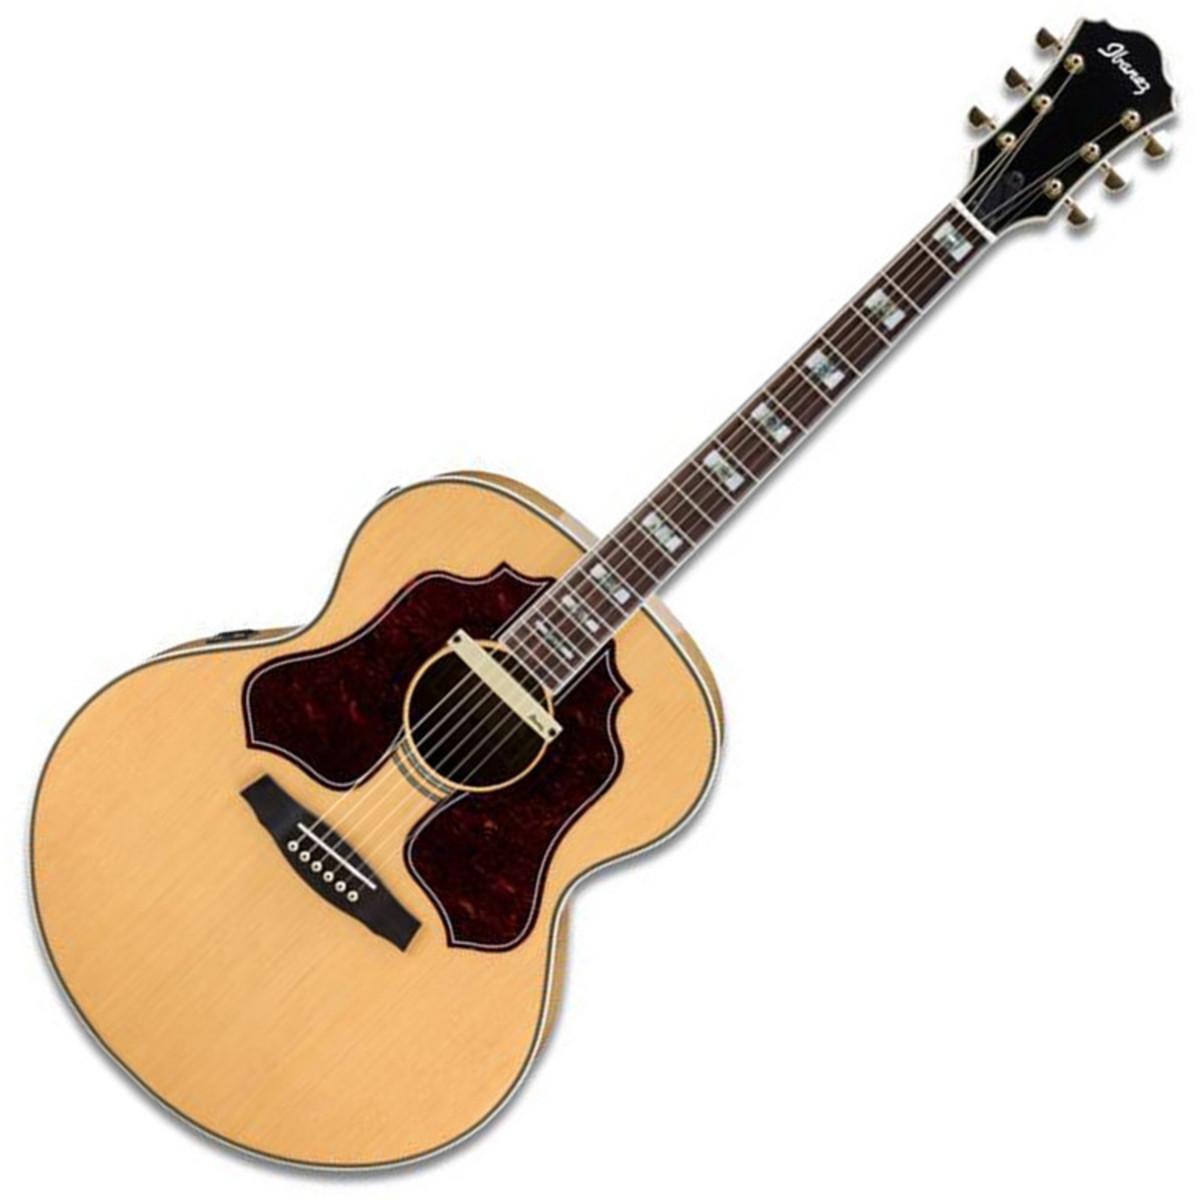 puis sage ibanez sge530 jumbo electro acoustique guitare. Black Bedroom Furniture Sets. Home Design Ideas